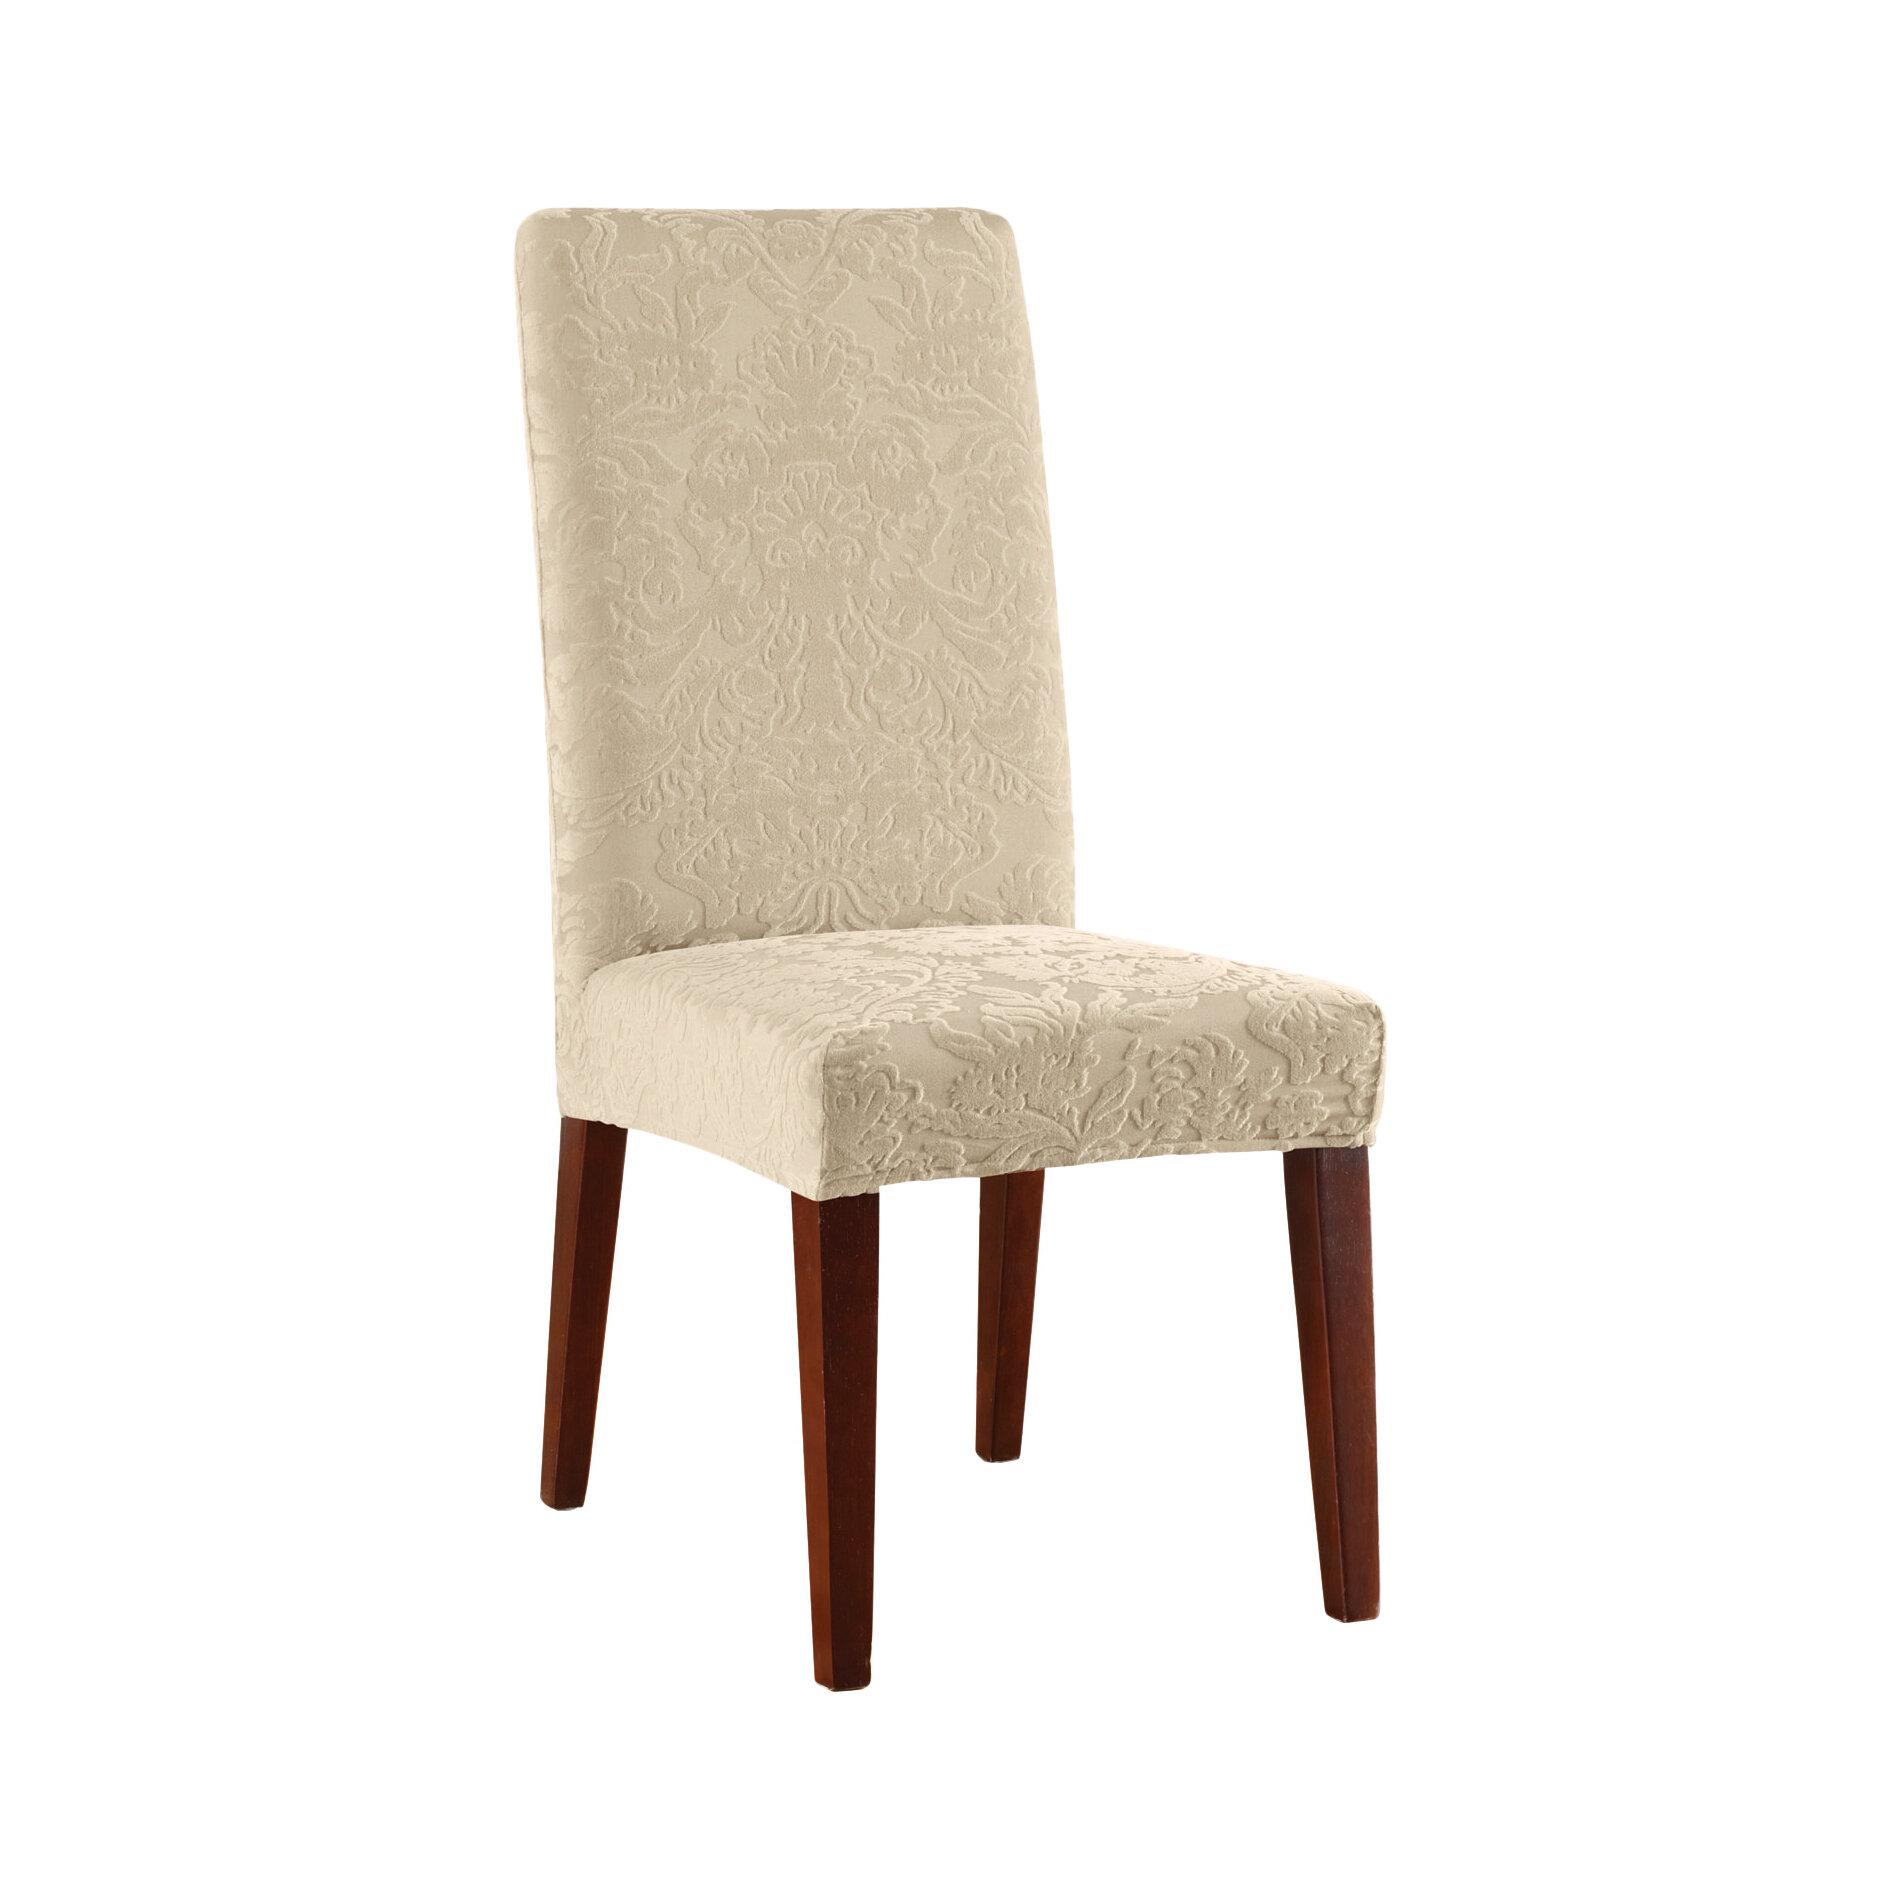 Tremendous Stretch Jacquard Damask T Cushion Dining Chair Slipcover Uwap Interior Chair Design Uwaporg